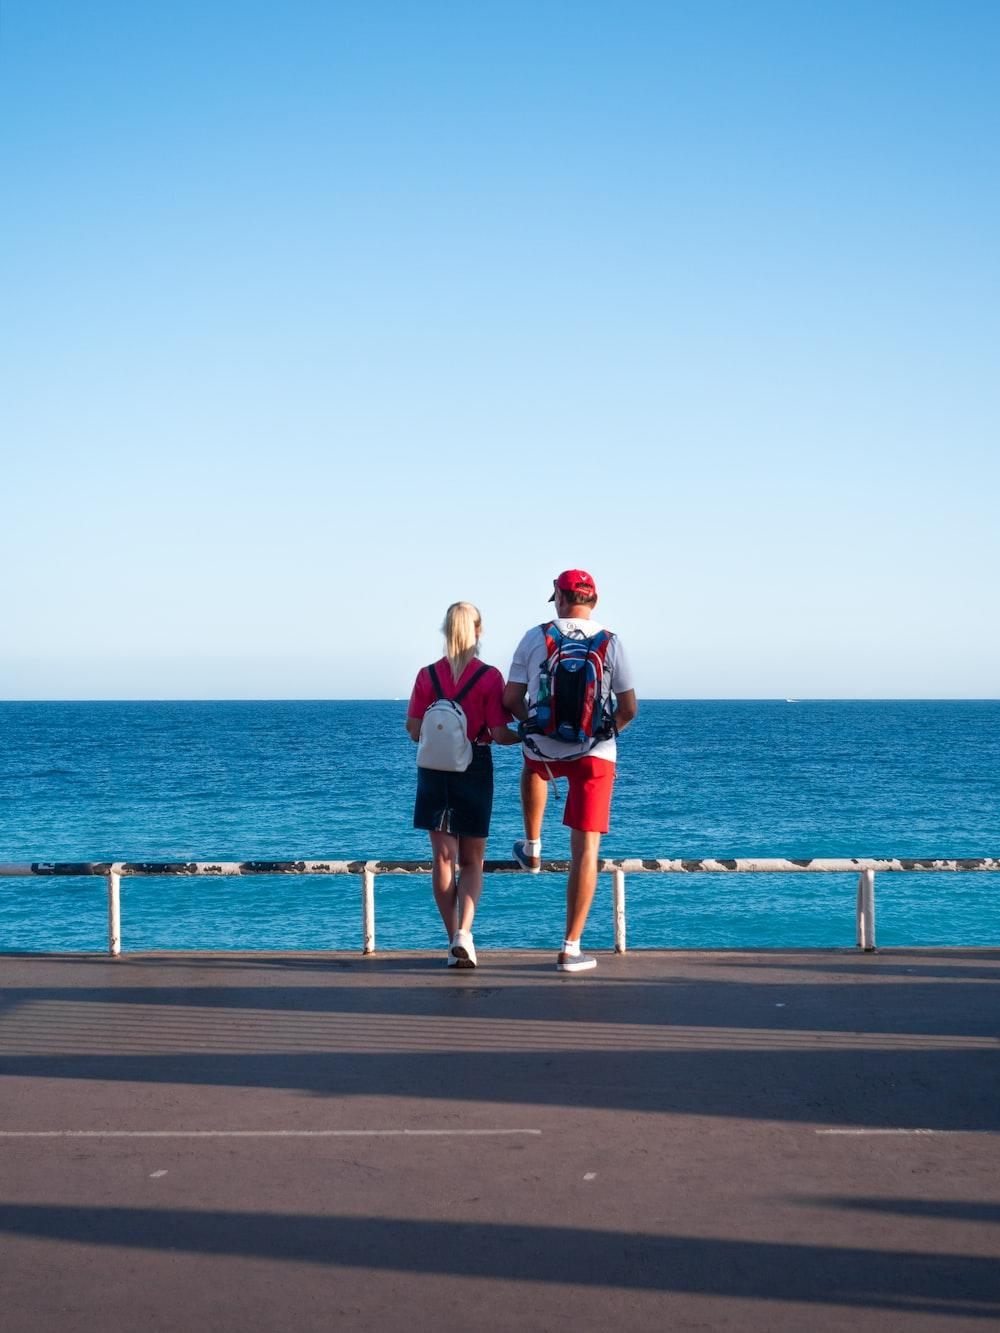 2 men standing on dock near body of water during daytime